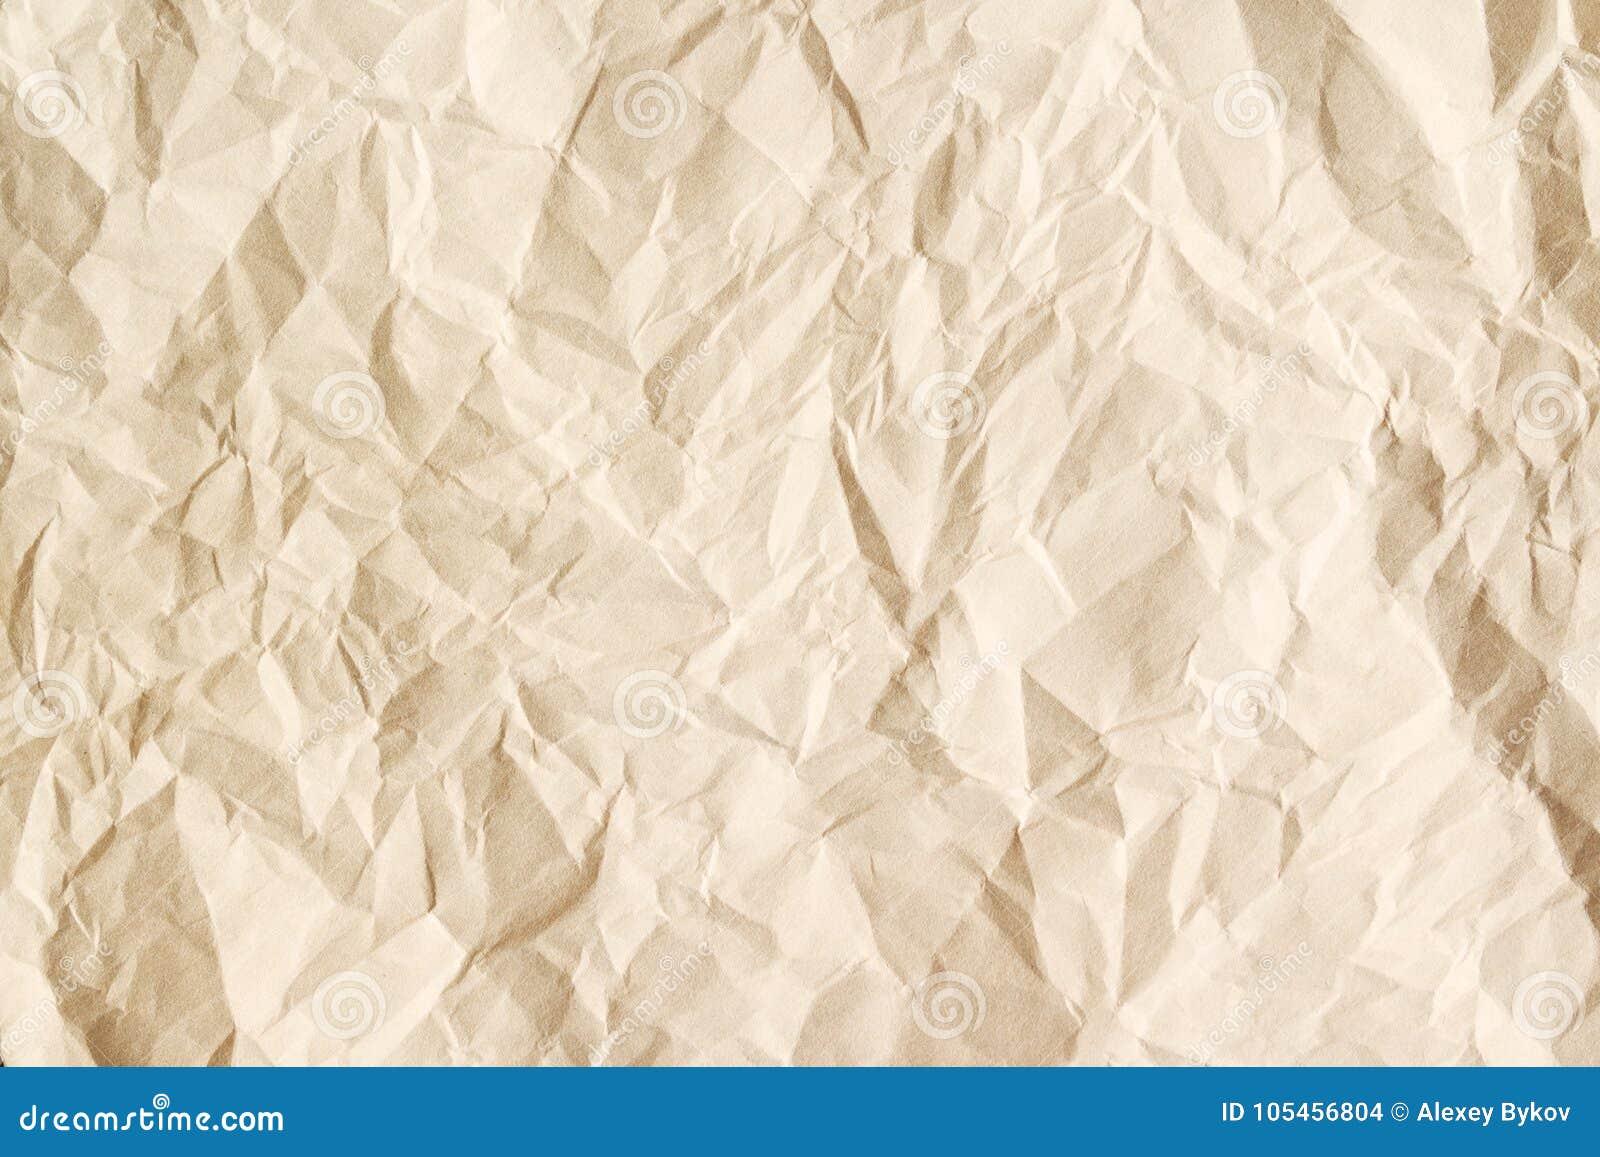 Постаретая бежом бумажная предпосылка листа